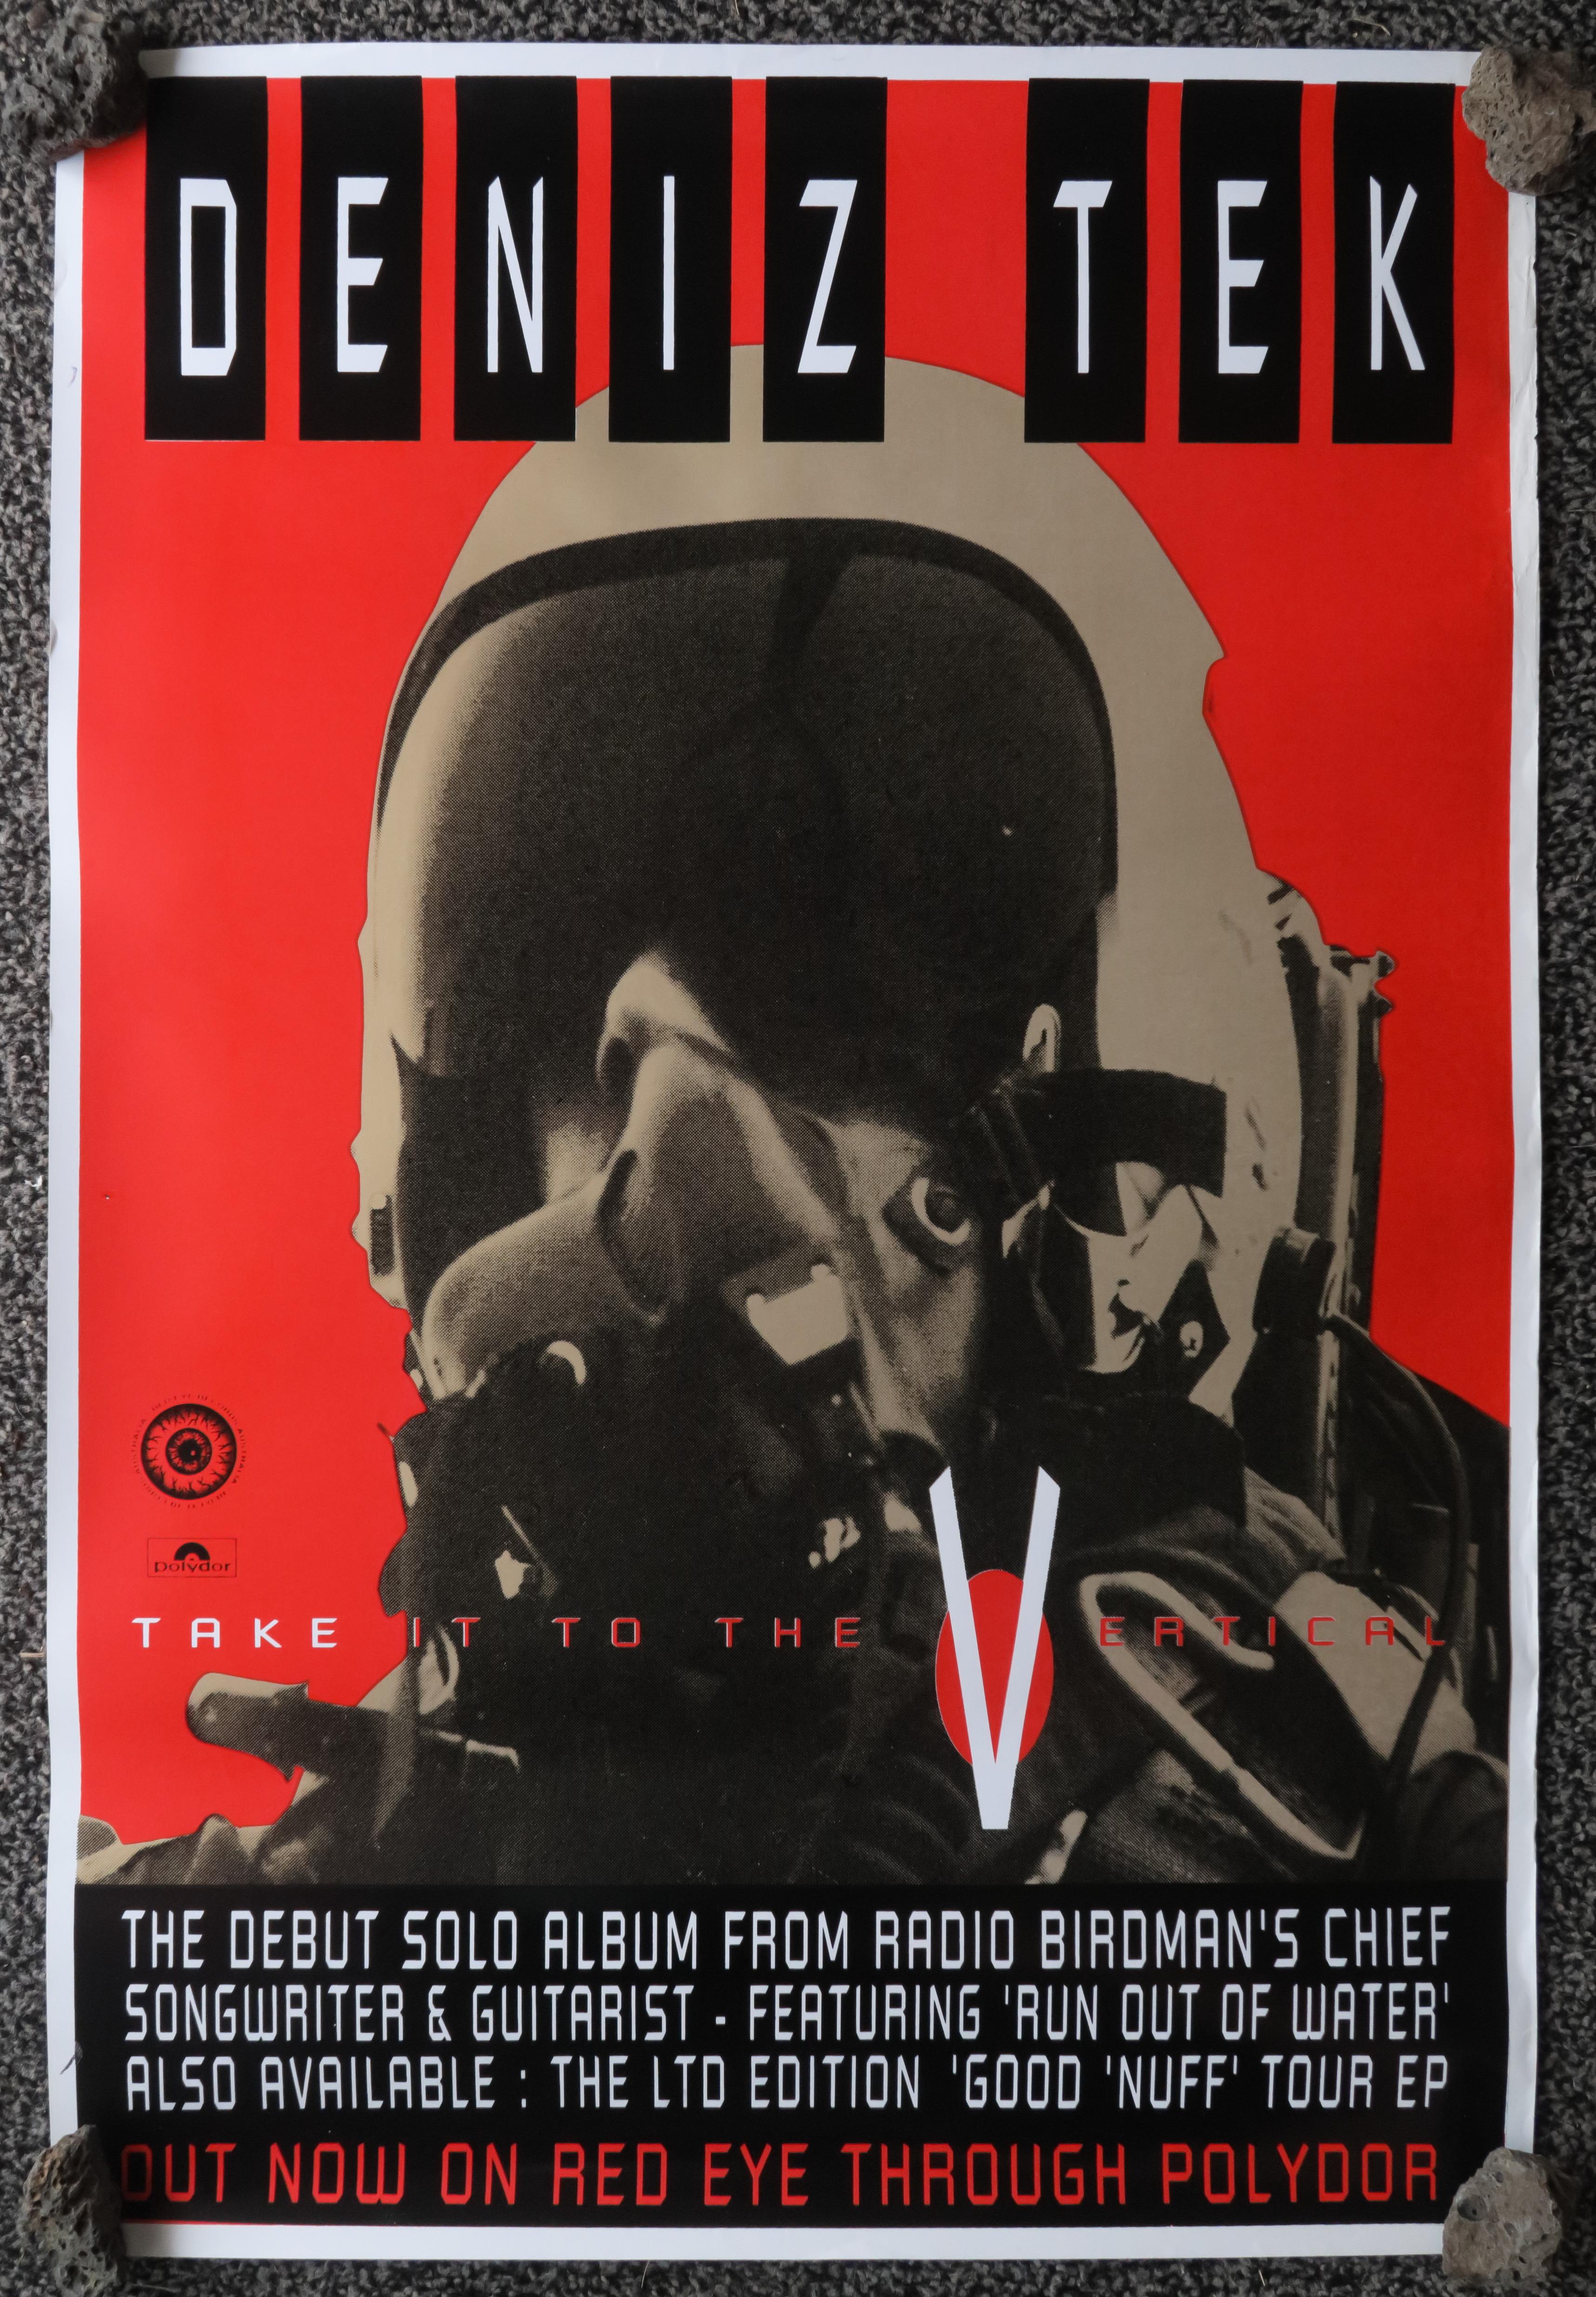 DT-Vertical-promo-1992.JPG